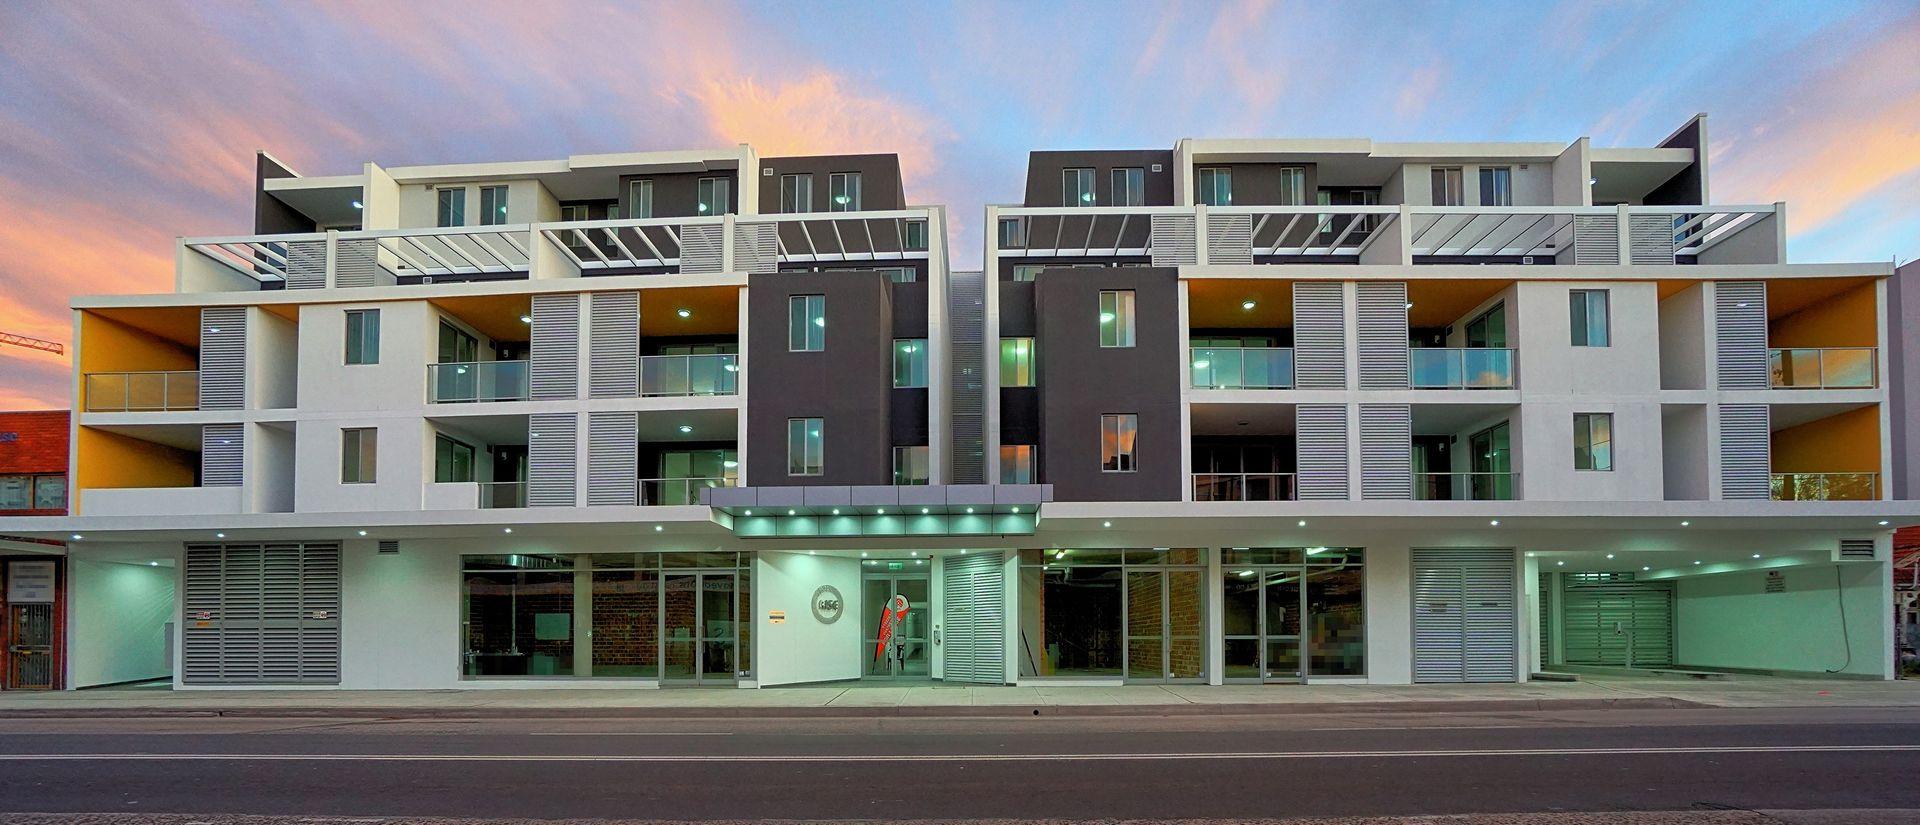 48/610-618 New Canterbury Rd, Hurlstone Park NSW 2193, Image 0